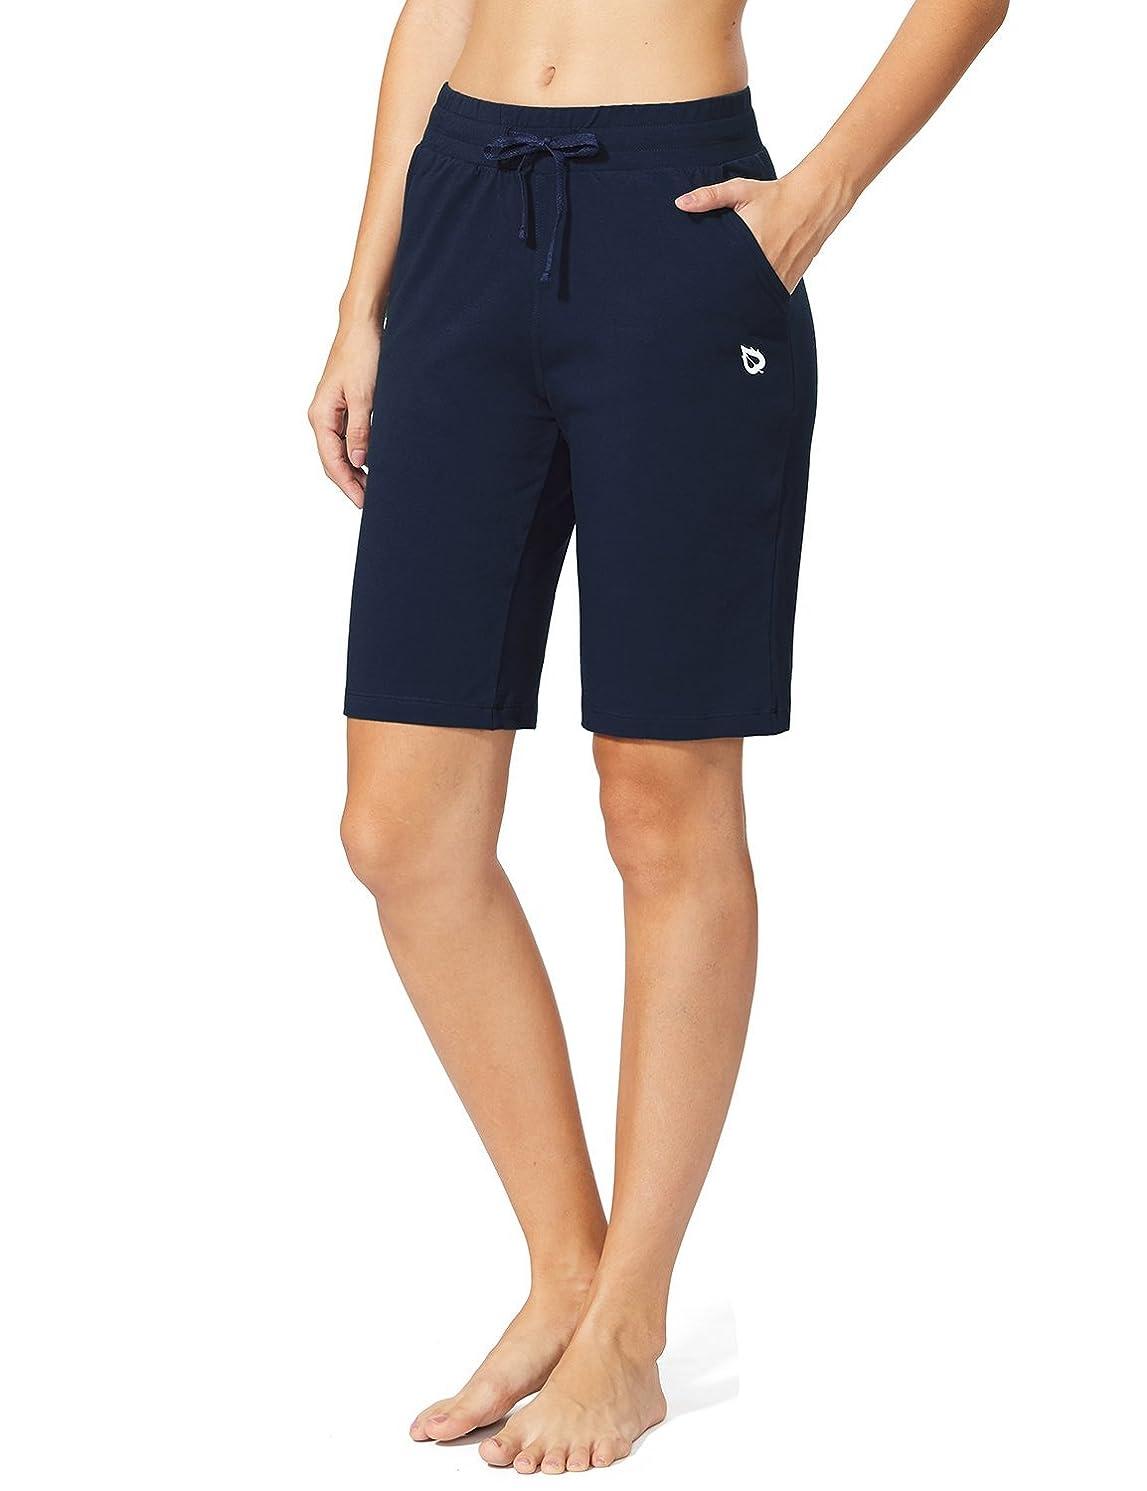 Baleaf Women's Active Yoga Lounge Bermuda Shorts with Pockets